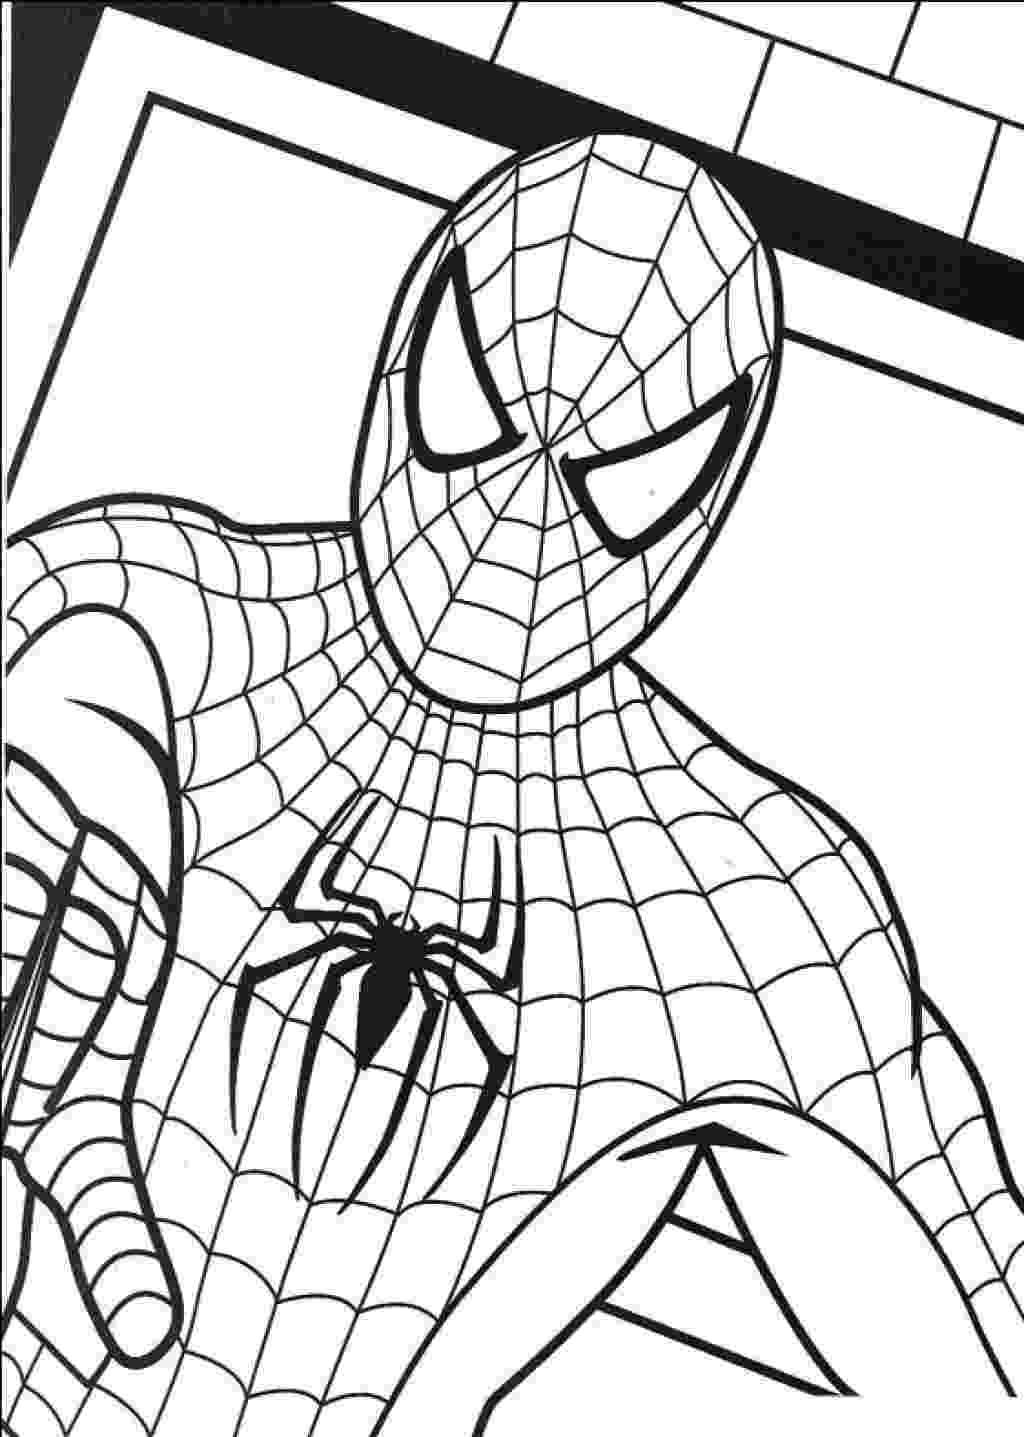 spiderman coloring sheet 10 spiderman happy birthday coloring pages top free coloring sheet spiderman